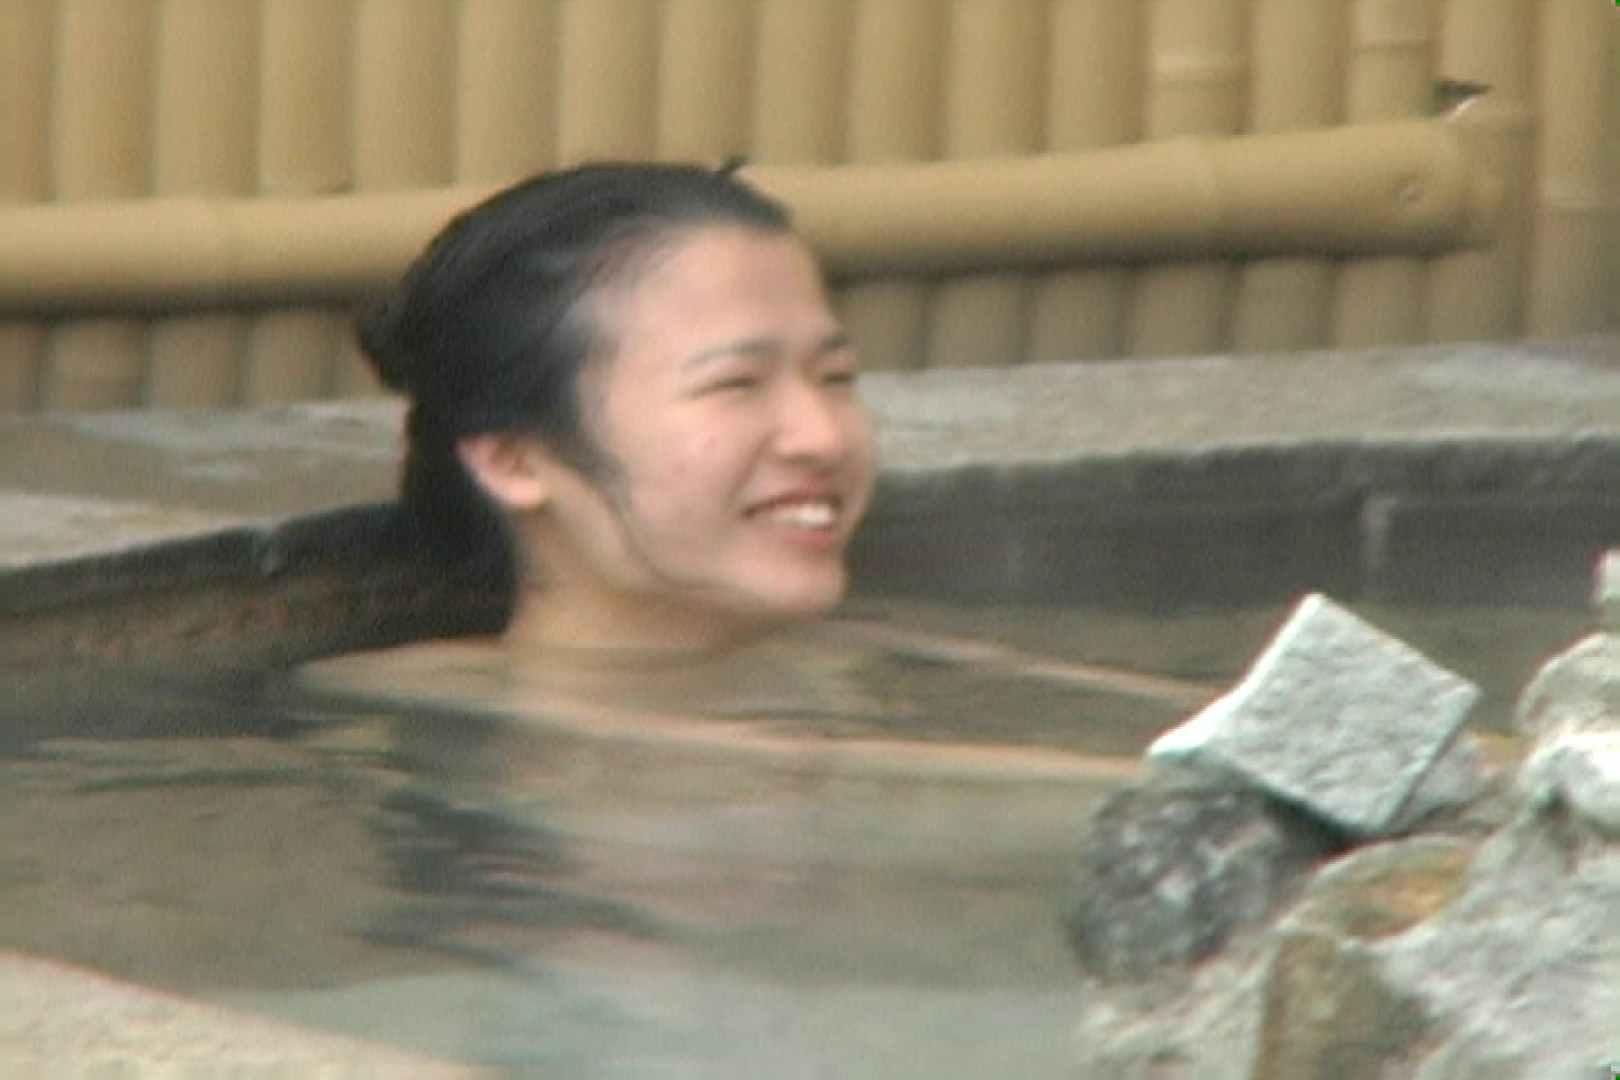 Aquaな露天風呂Vol.647 OLセックス 盗撮戯れ無修正画像 83画像 29